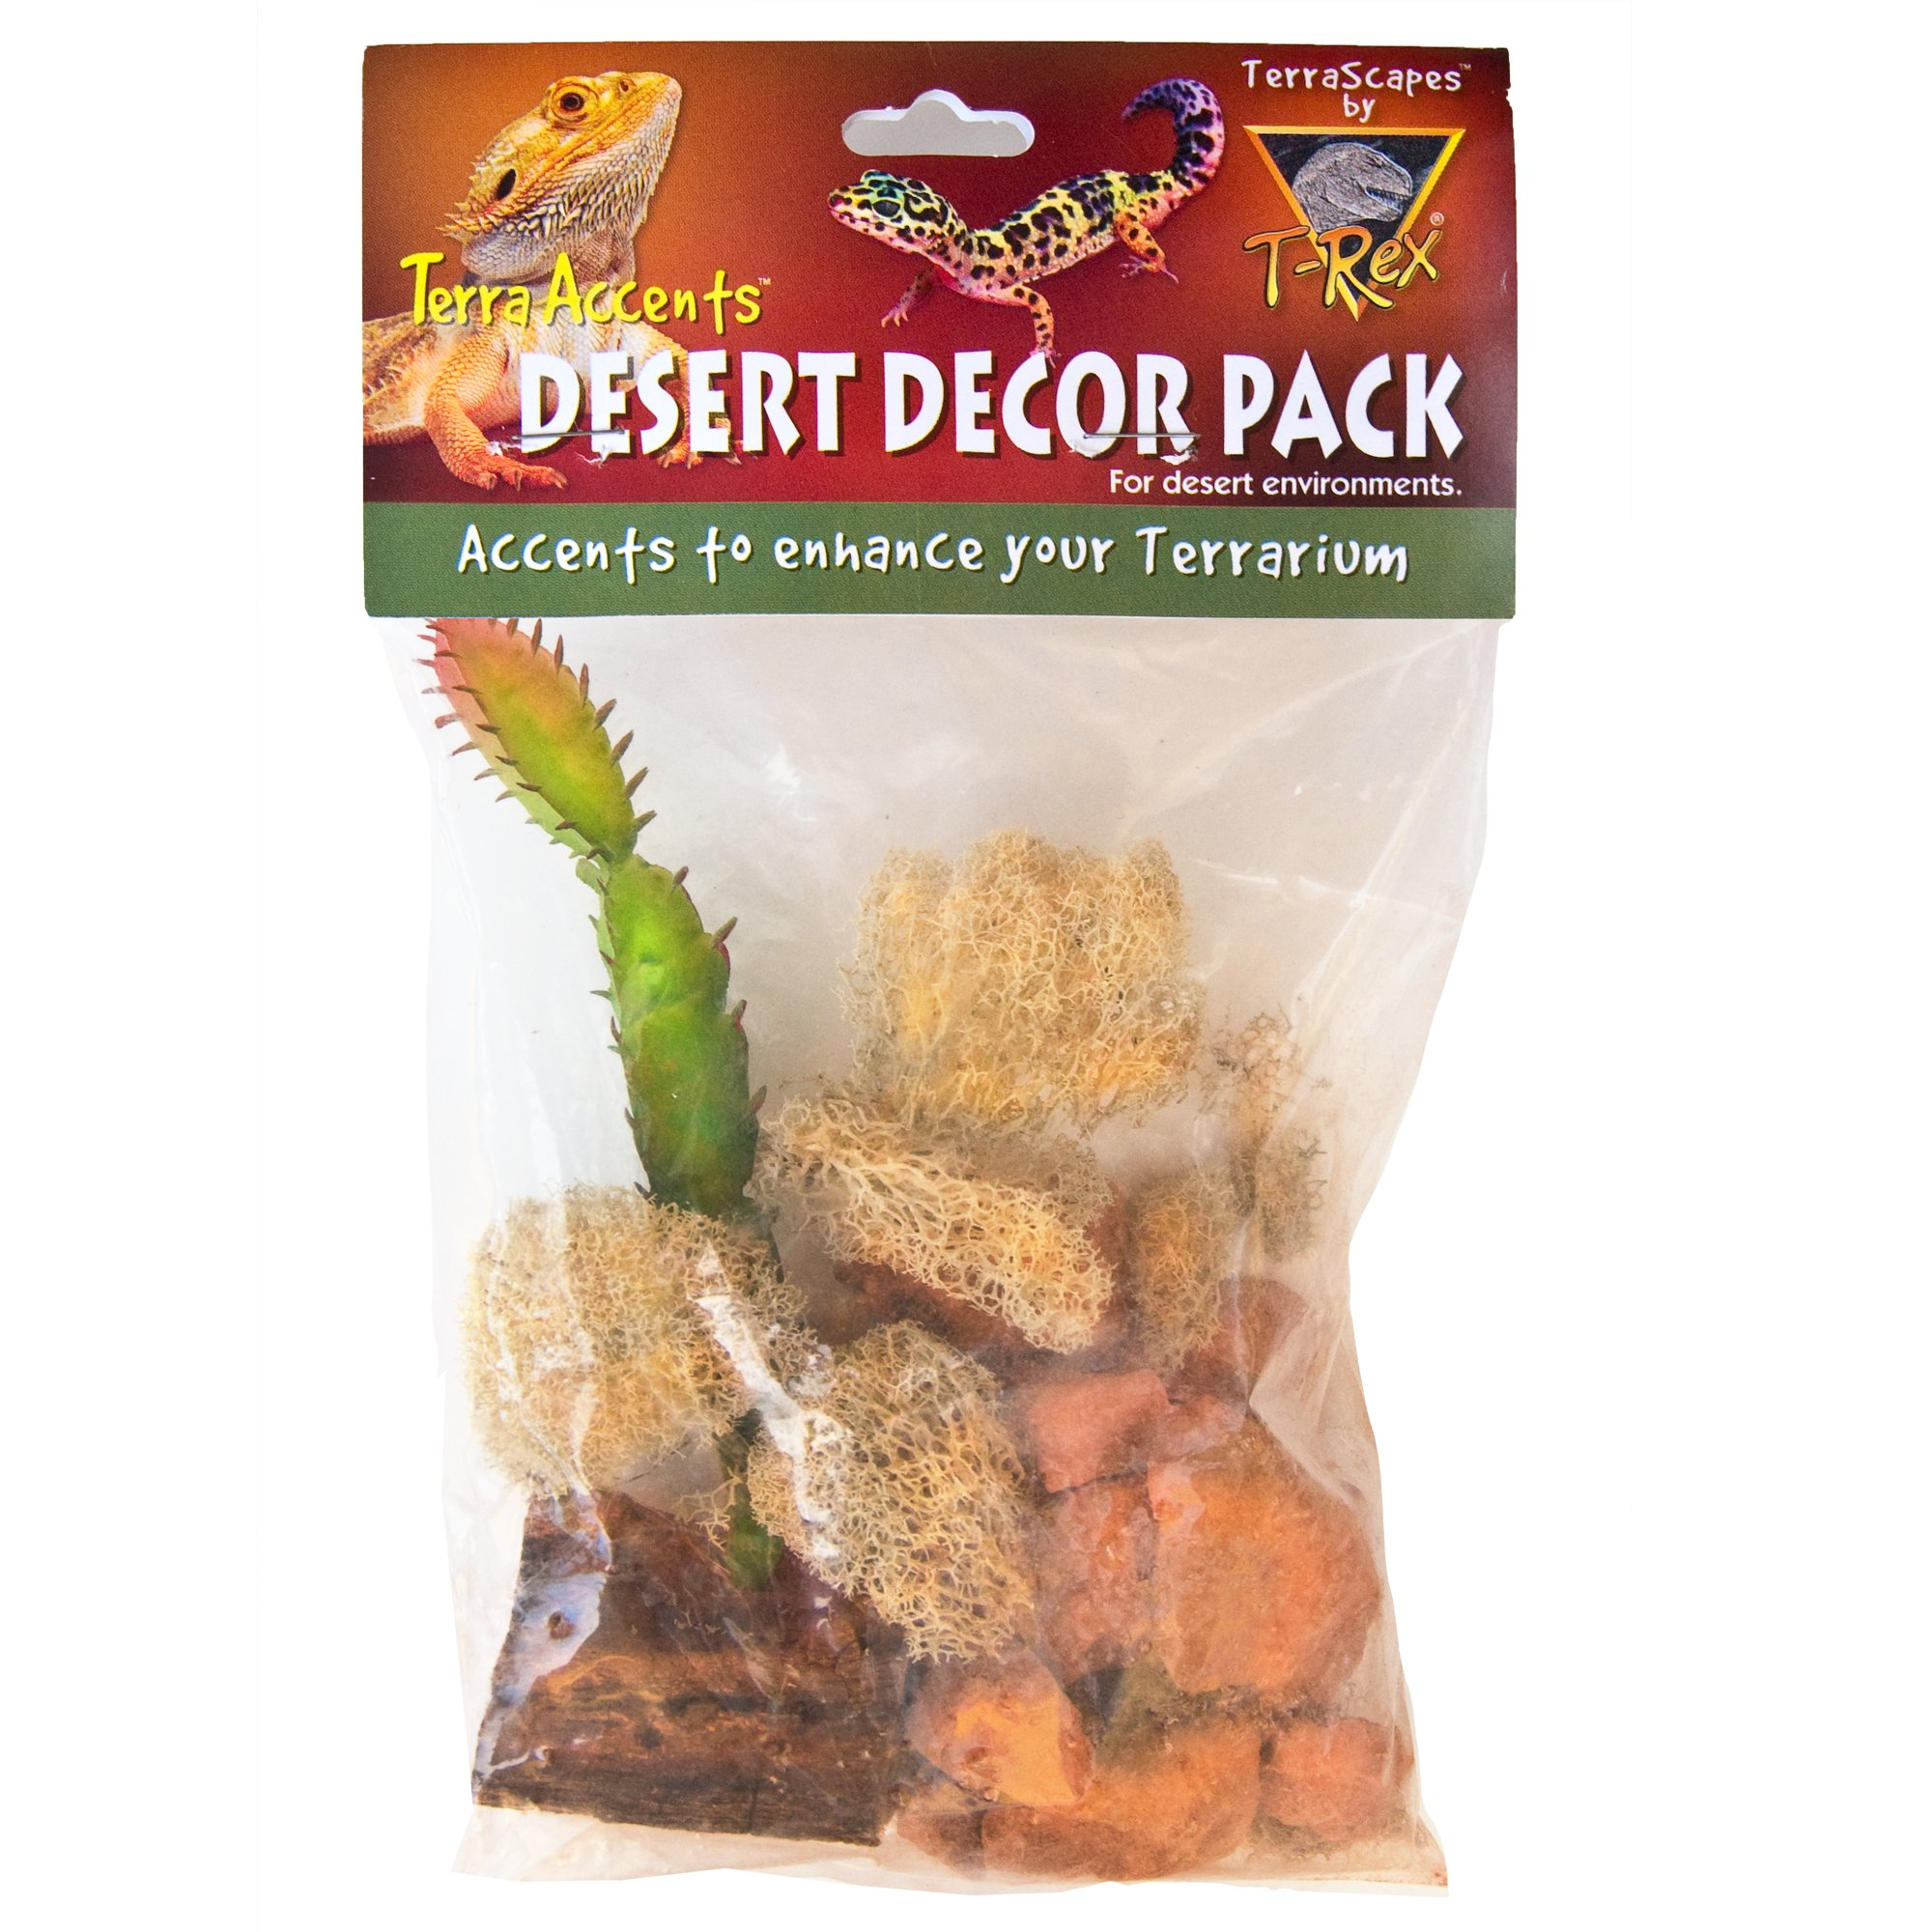 T Rex Terra Accents Desert Decor Pack Petco